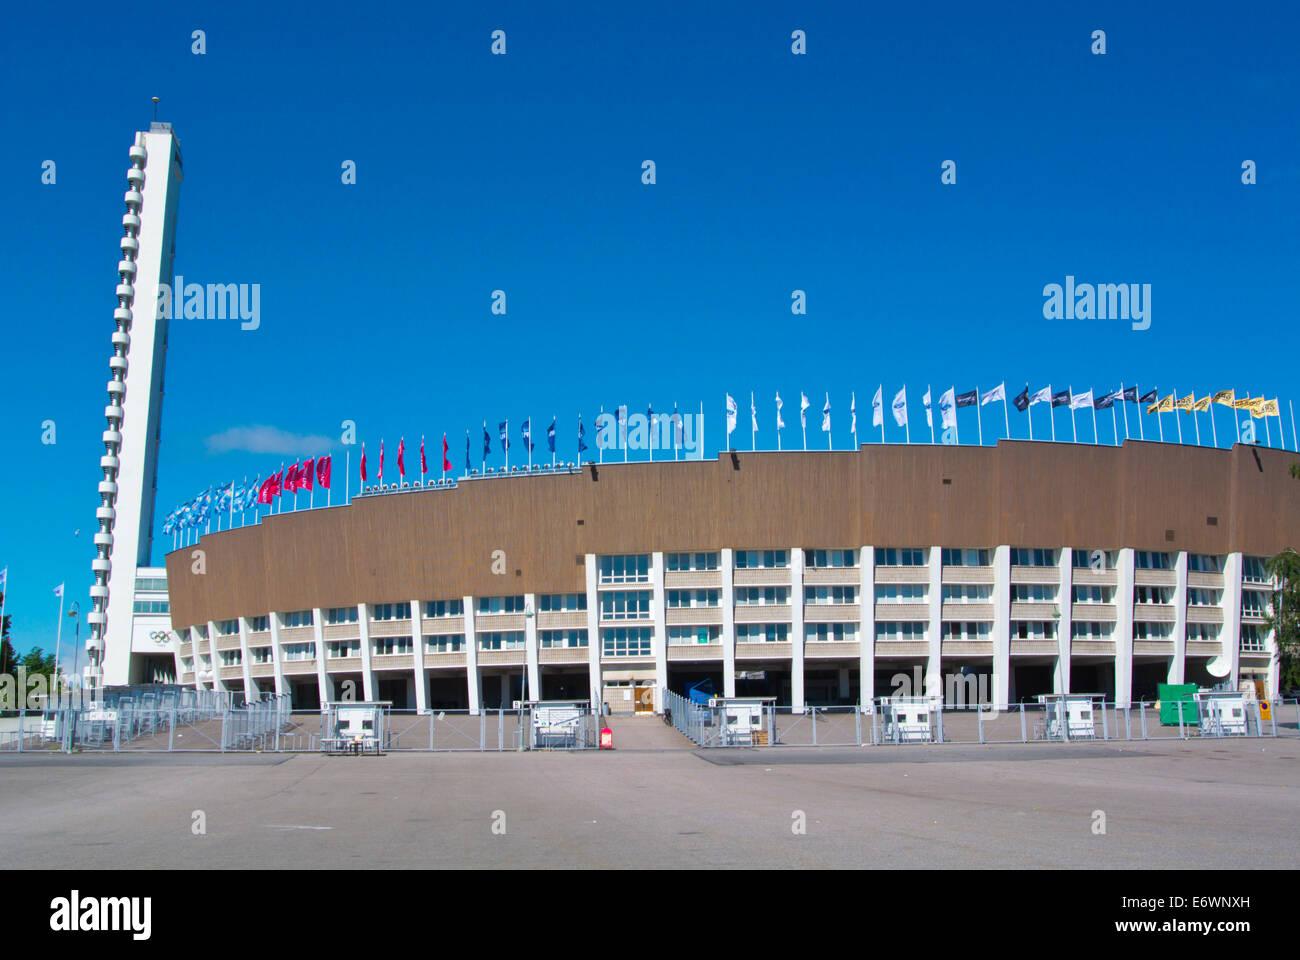 Olympiastadion, the Olympic Stadium (1952), by Yrjö Lindegren, Taka-Töölö district, central - Stock Image